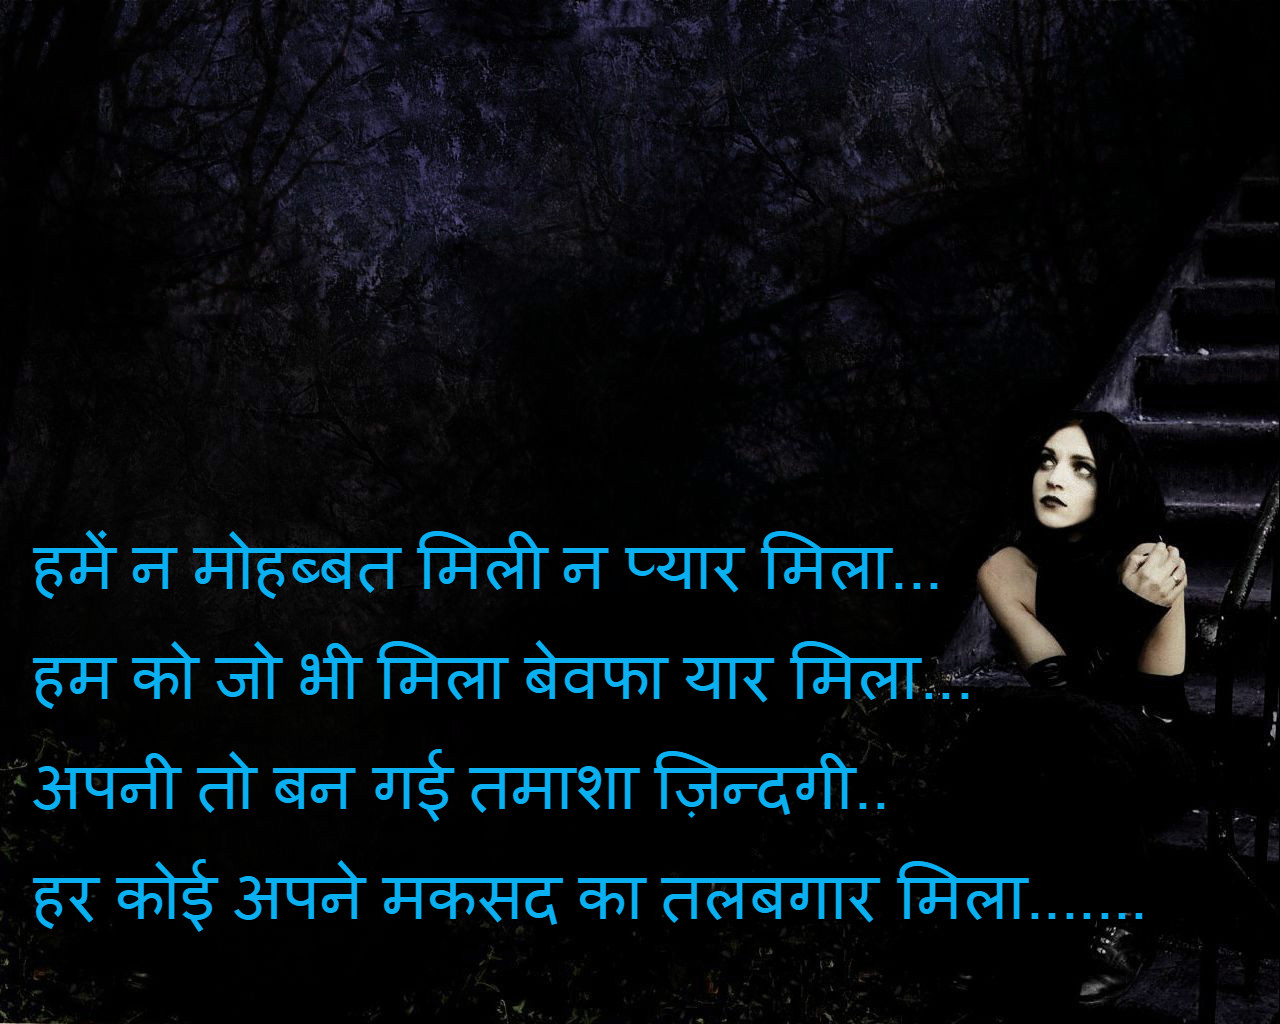 Shayari Hi Shayari: hindi love shayari image download ,Hindi Shayari ...